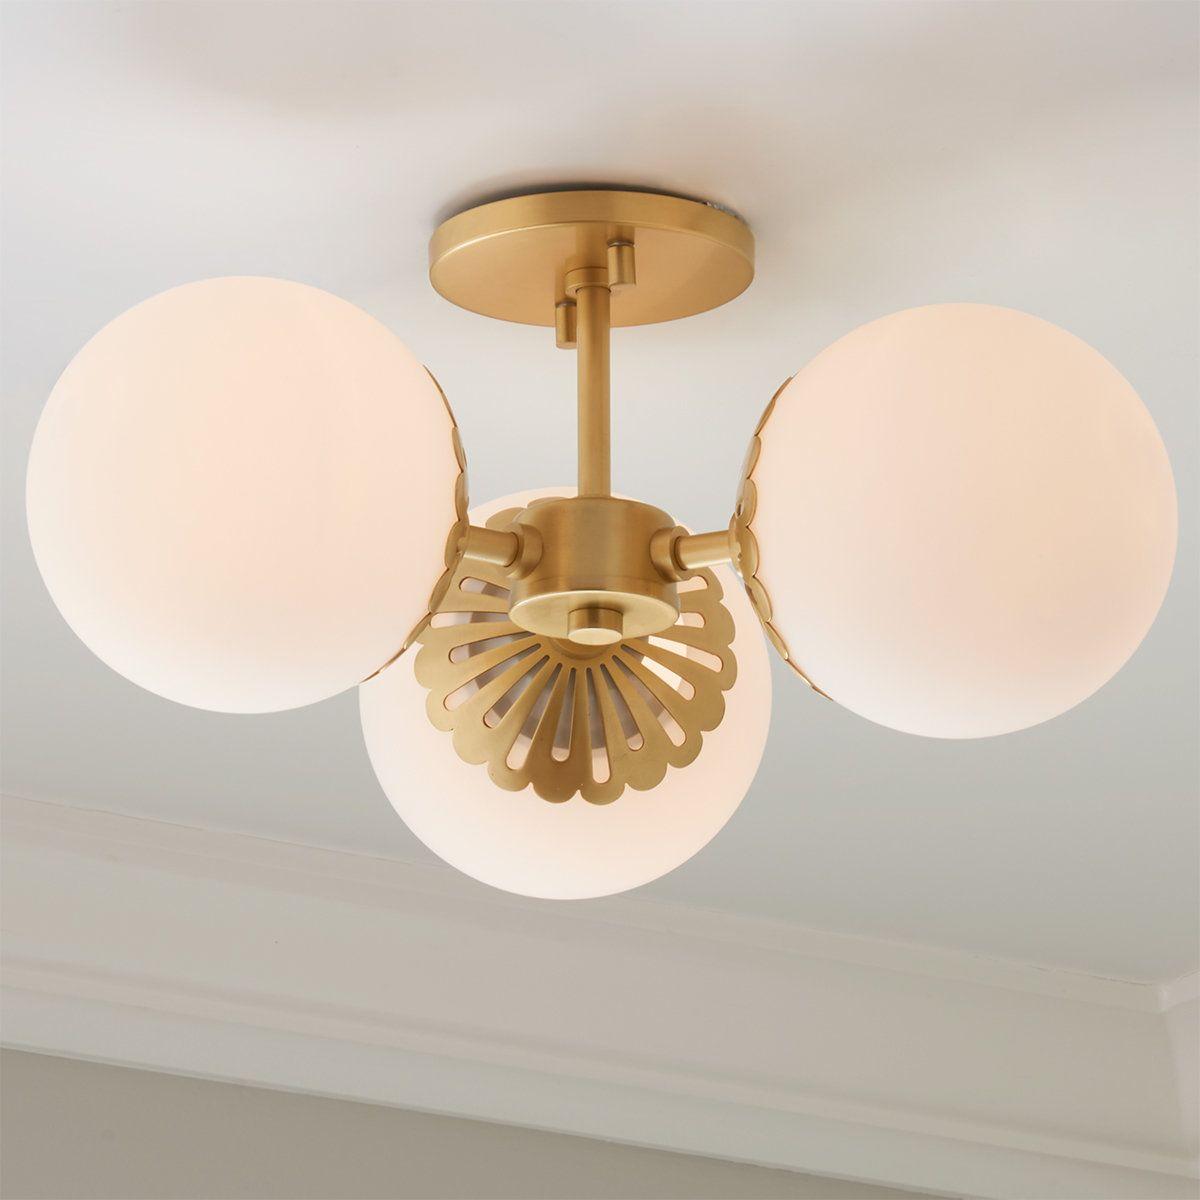 500 Lights Flush Mount And Semi Flush Ceiling Ideas In 2021 Semi Flush Lighting Ceiling Lights Lights